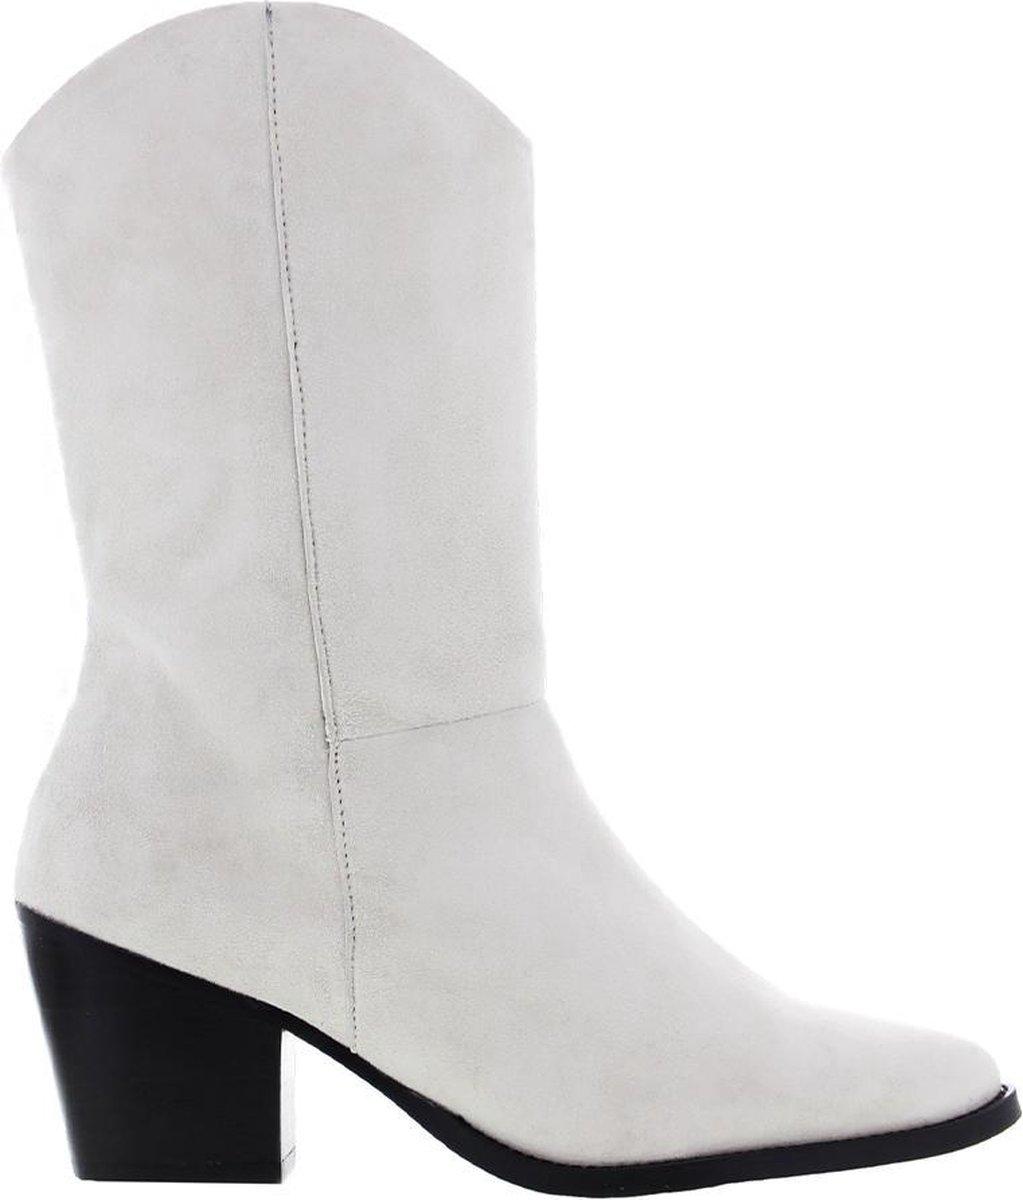 Tango | Ella square 12-e bone white kid suede boot - black heel | Maat: 37